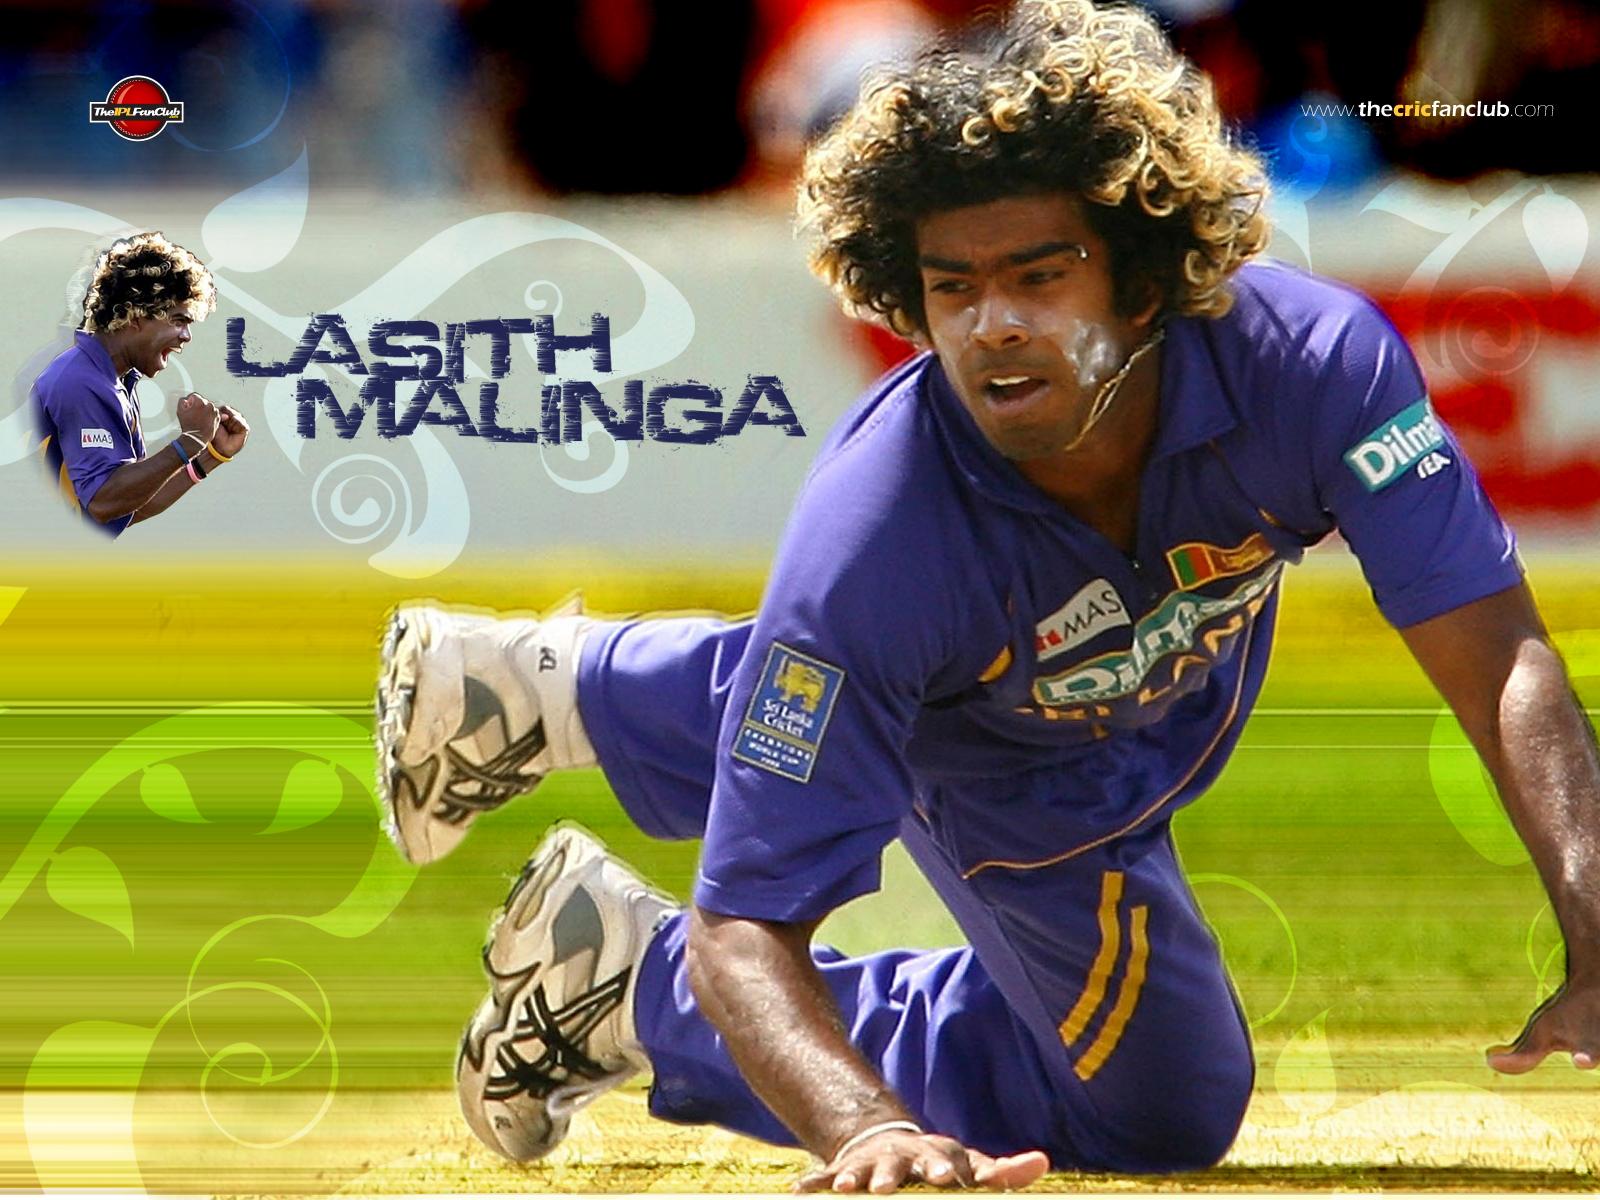 Download HQ Cricket wallpaper / Sports / 1600x1200